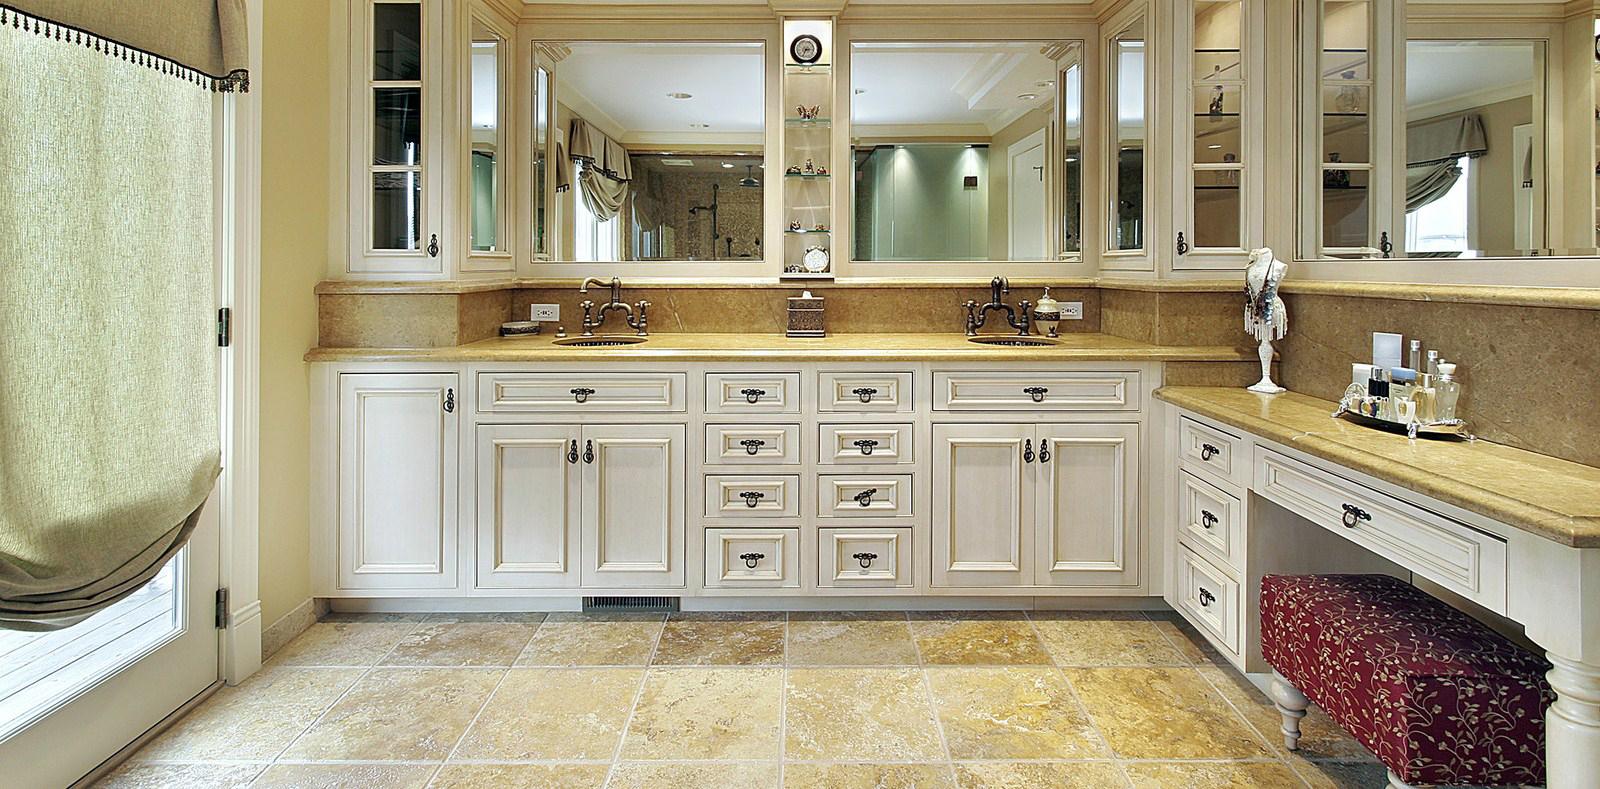 kitchen cleanliness granite worktops makes easy cleaning granite kitchen countertops Granite kitchen countertops